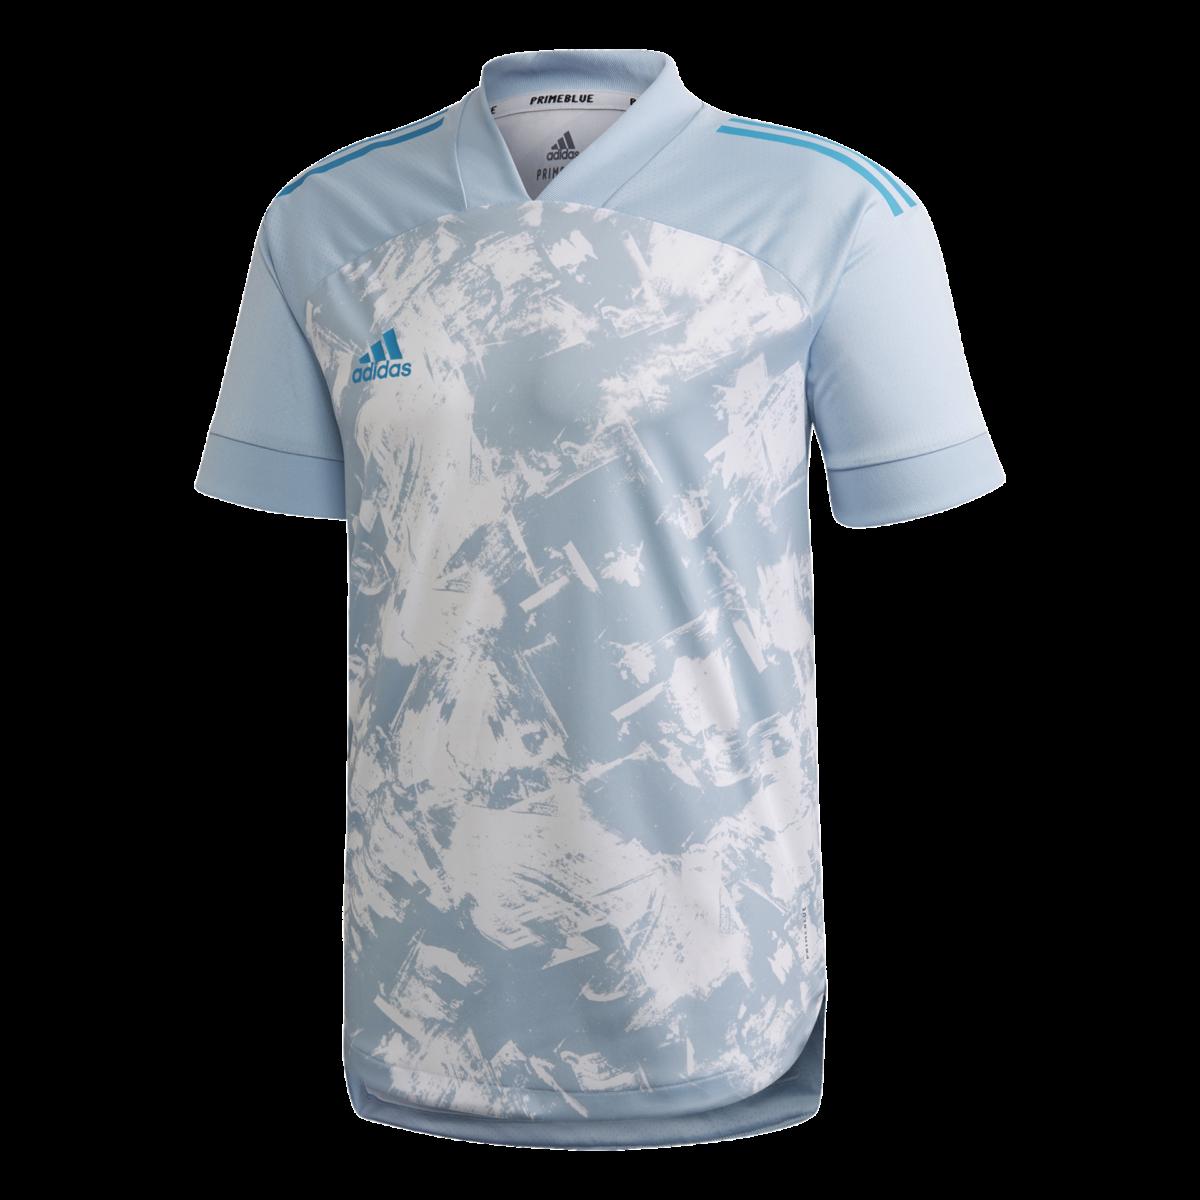 Adidas Condivo 20 Primeblue Football Shirt - ADULT NEW for 2020 FI4220